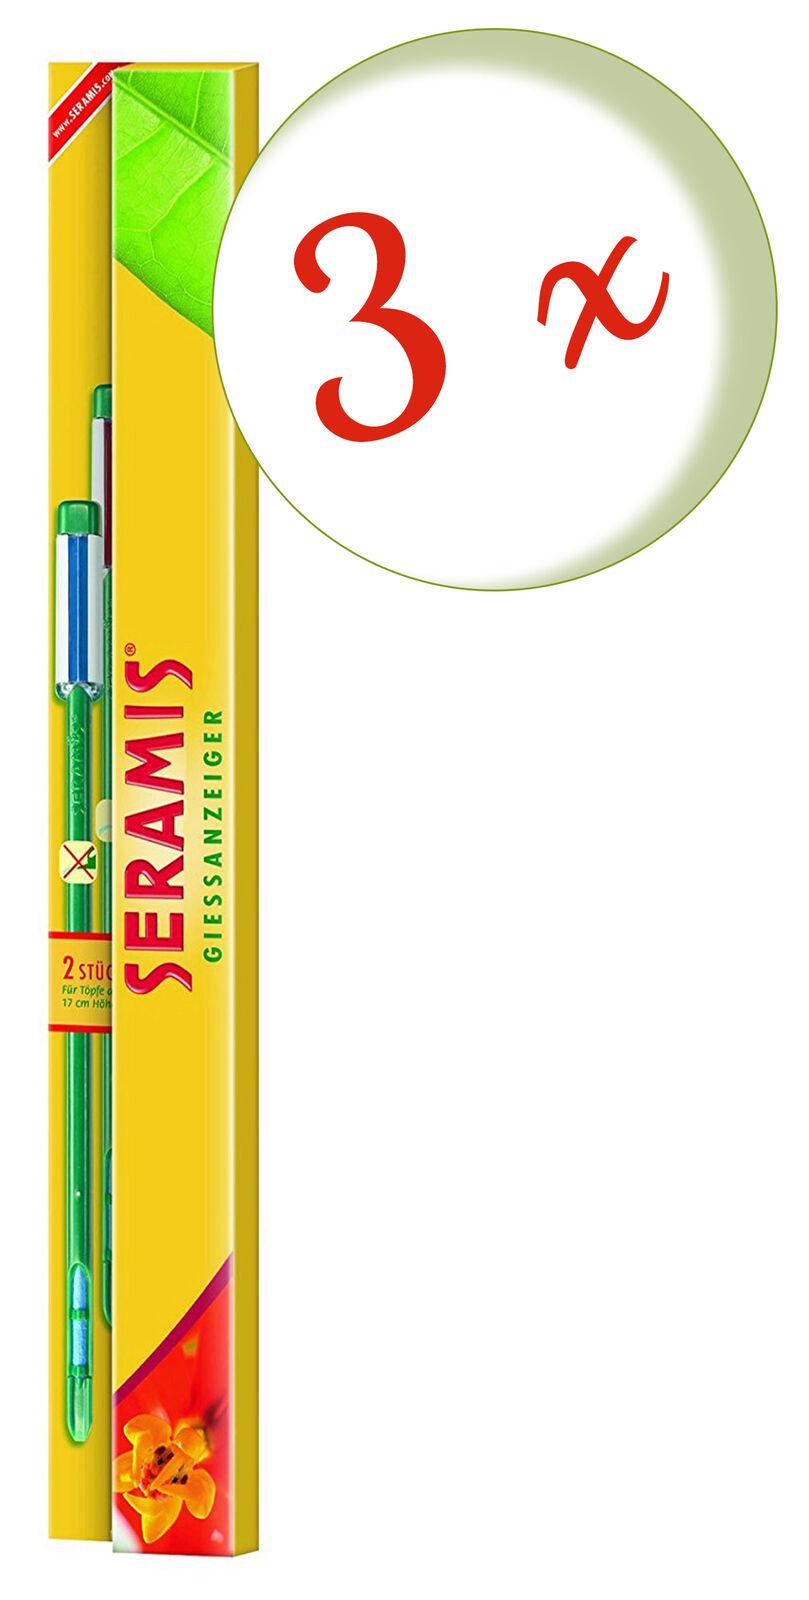 Savings Set: 3 X Seramis Indicator Indoor Large, 2 Piece